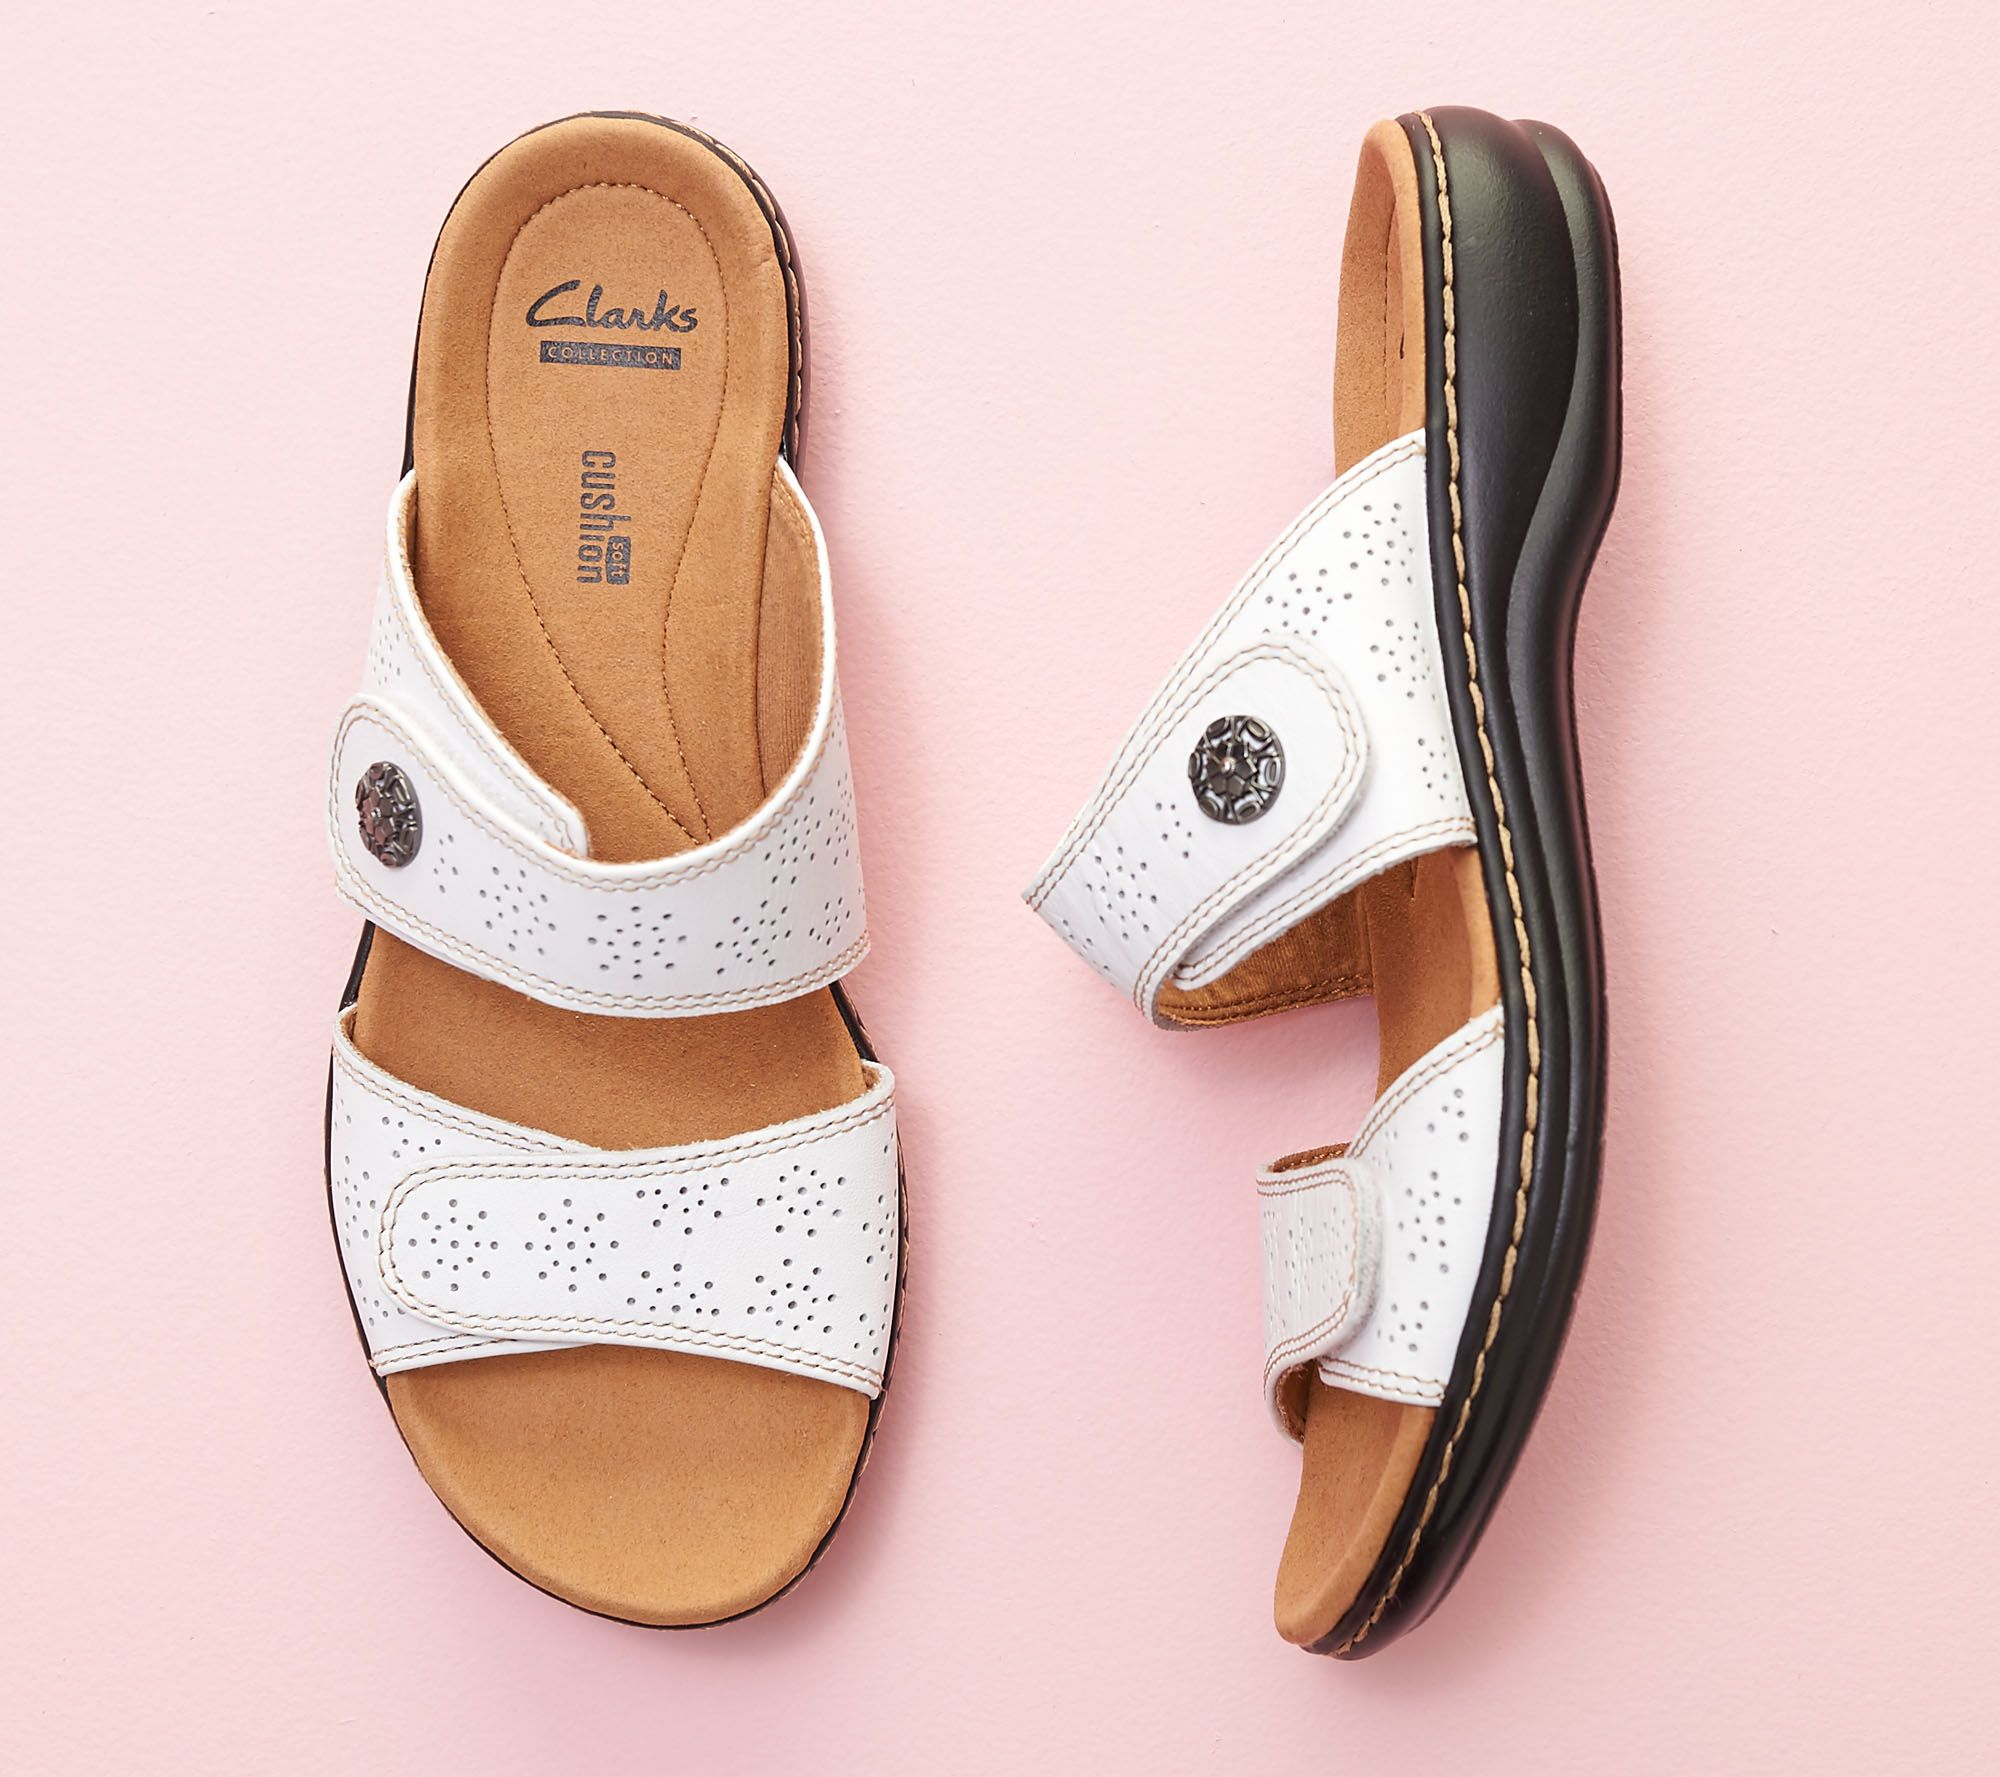 fcae817098f Clarks Leather Double Adjust Slide Sandals - Leisa Lacole - Page 1 — QVC.com